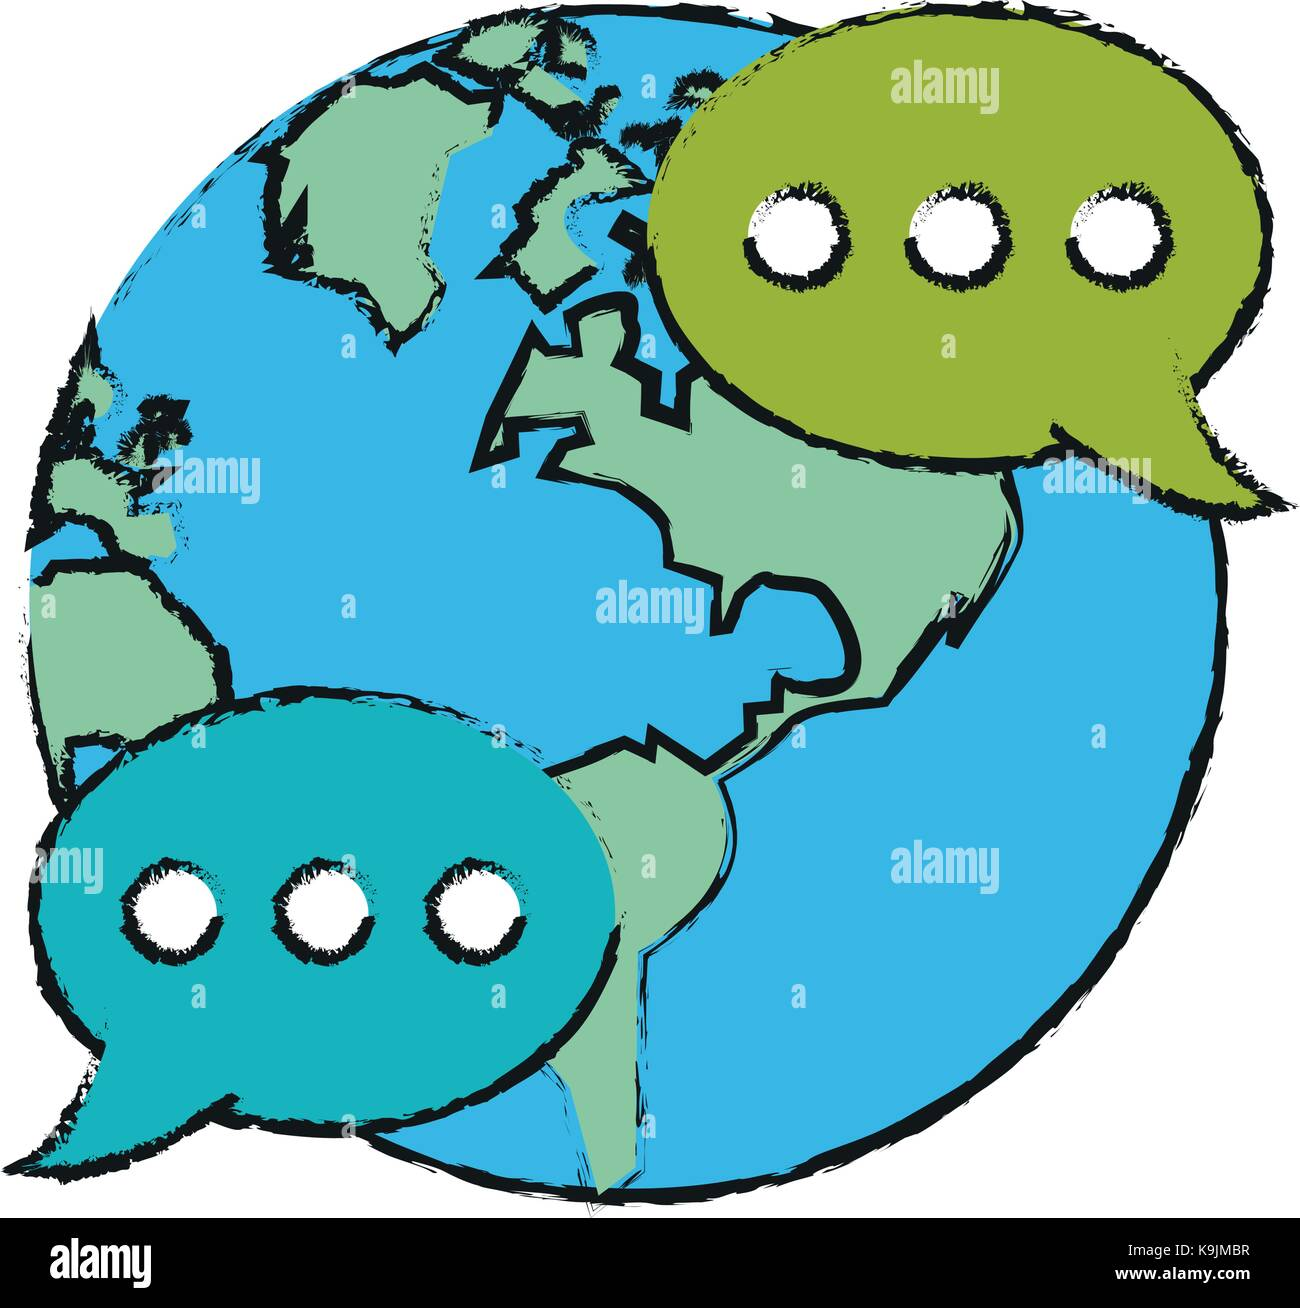 Global chat symbol - Stock Vector